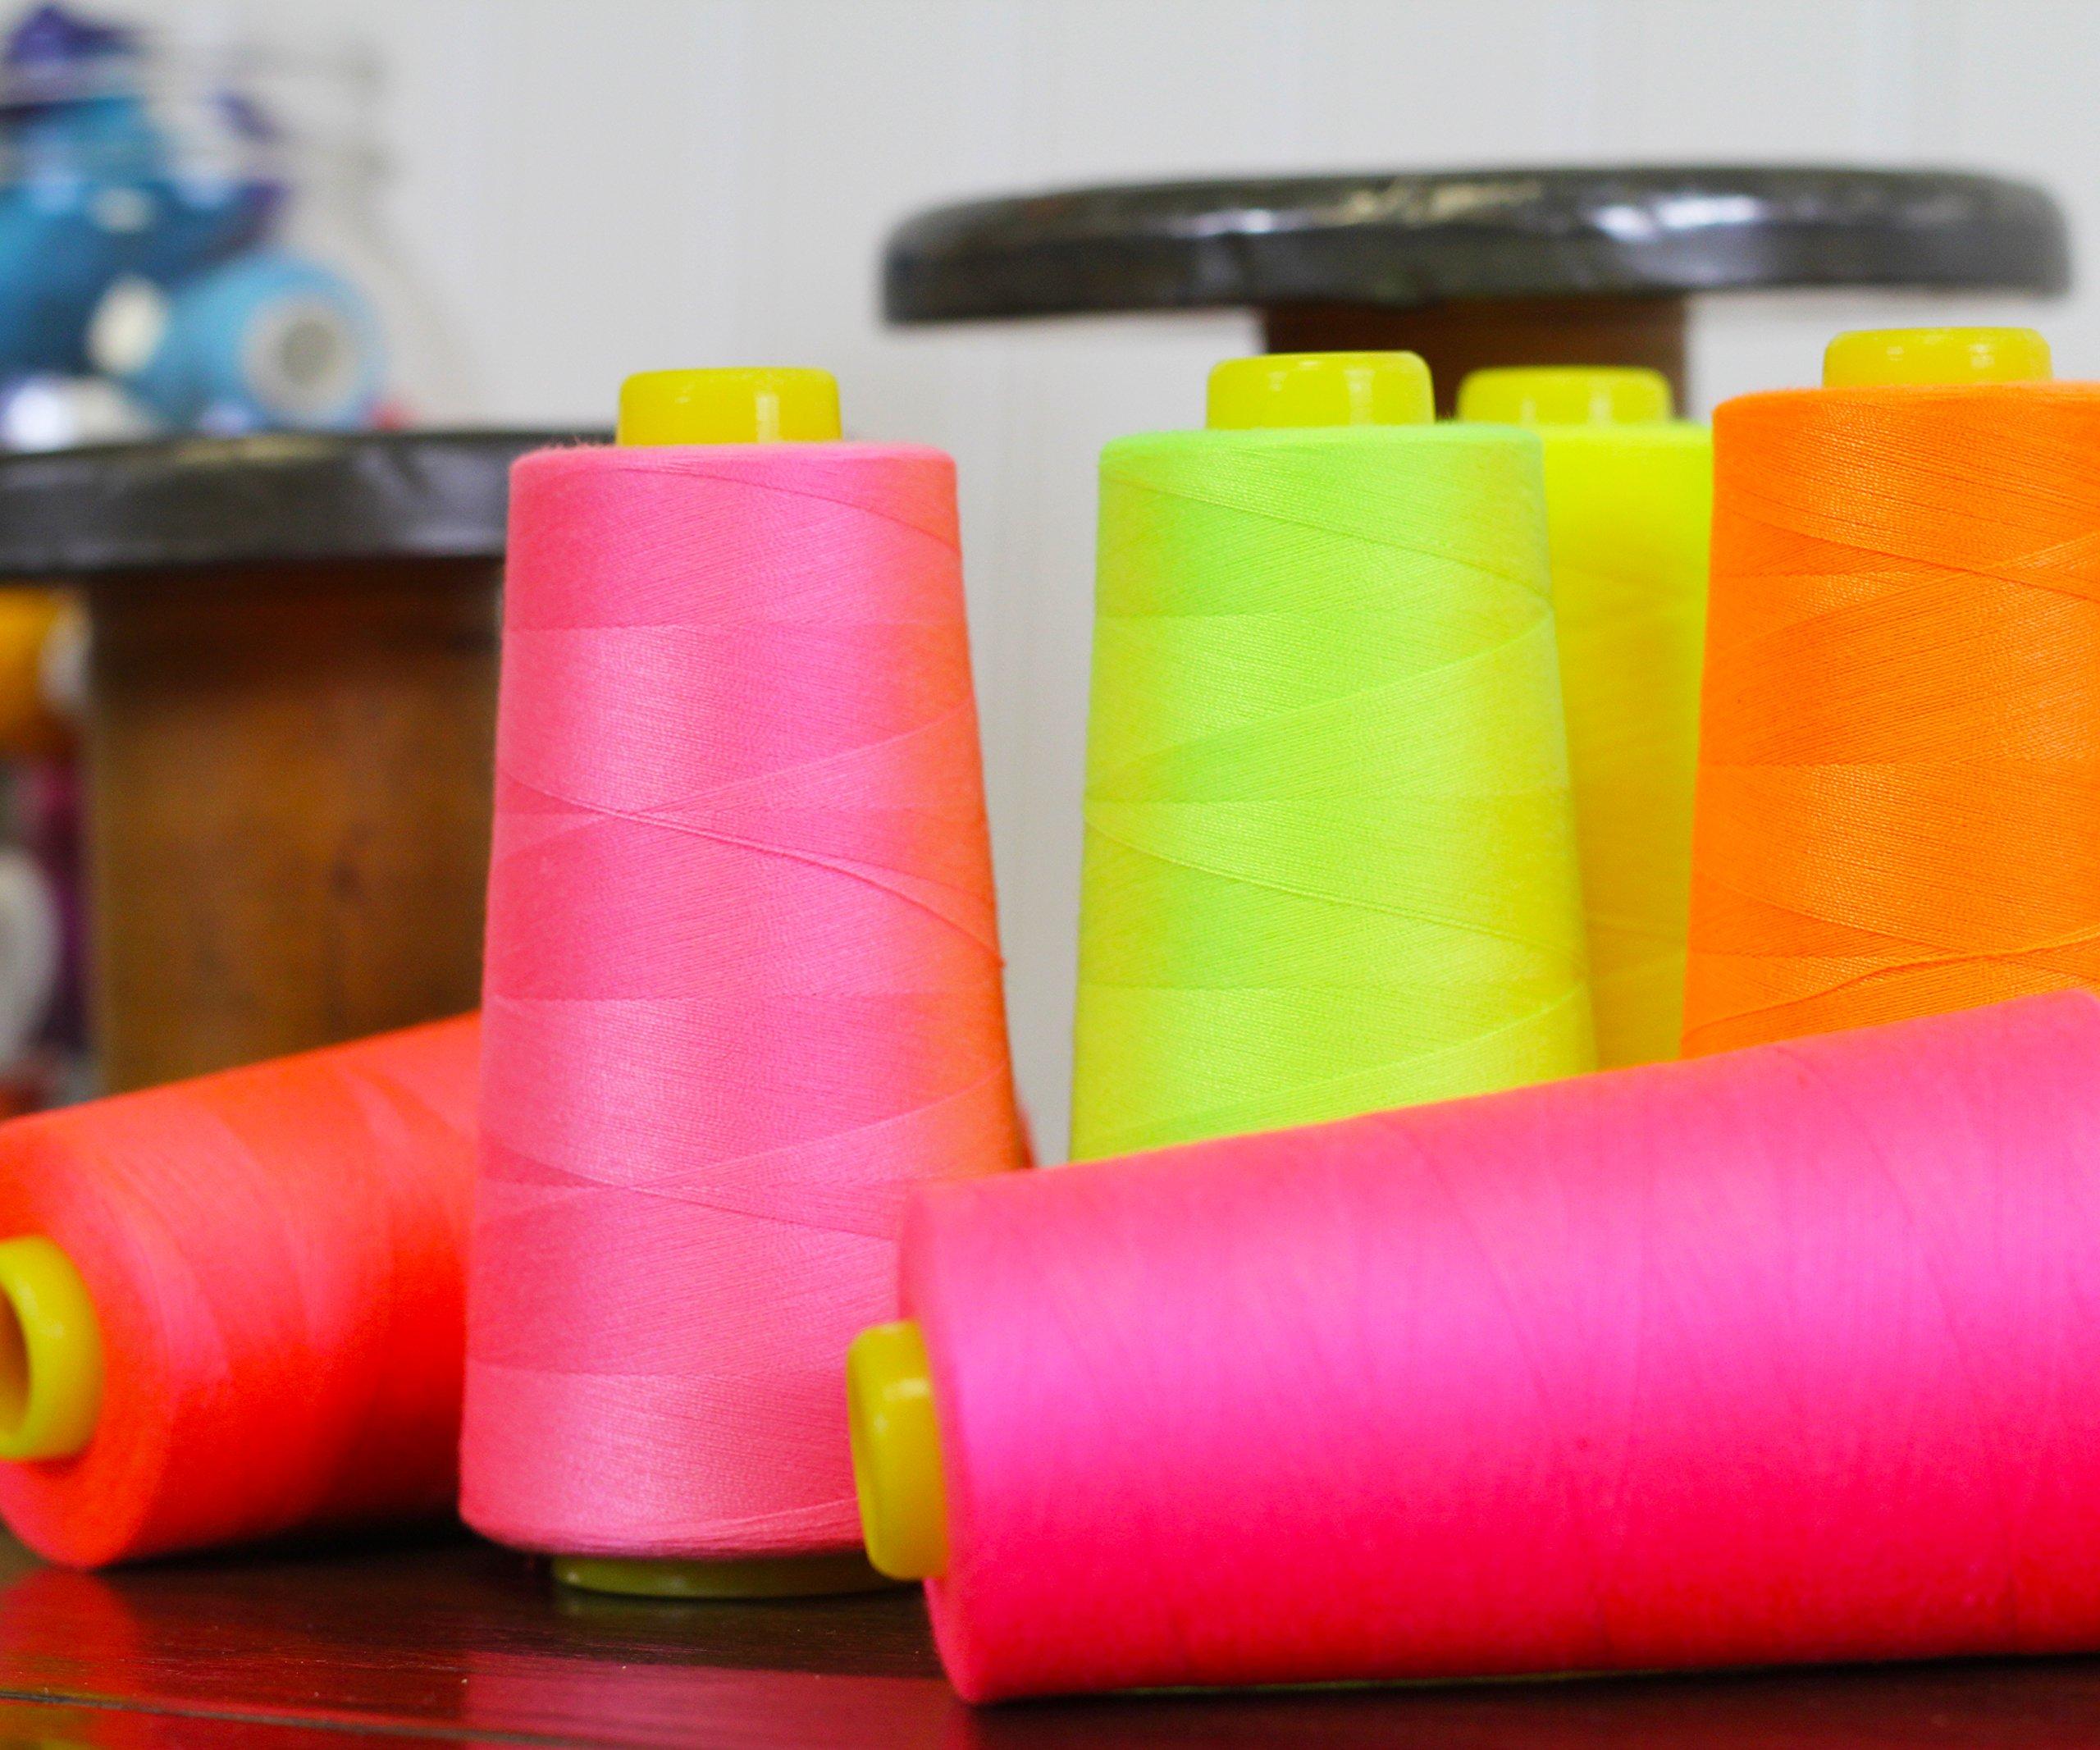 50 Colors of Serger Sewing Overlock Thread Set - Spun Polyester - 2750 Yards Per Cone - 40/2 - Threadart by Threadart